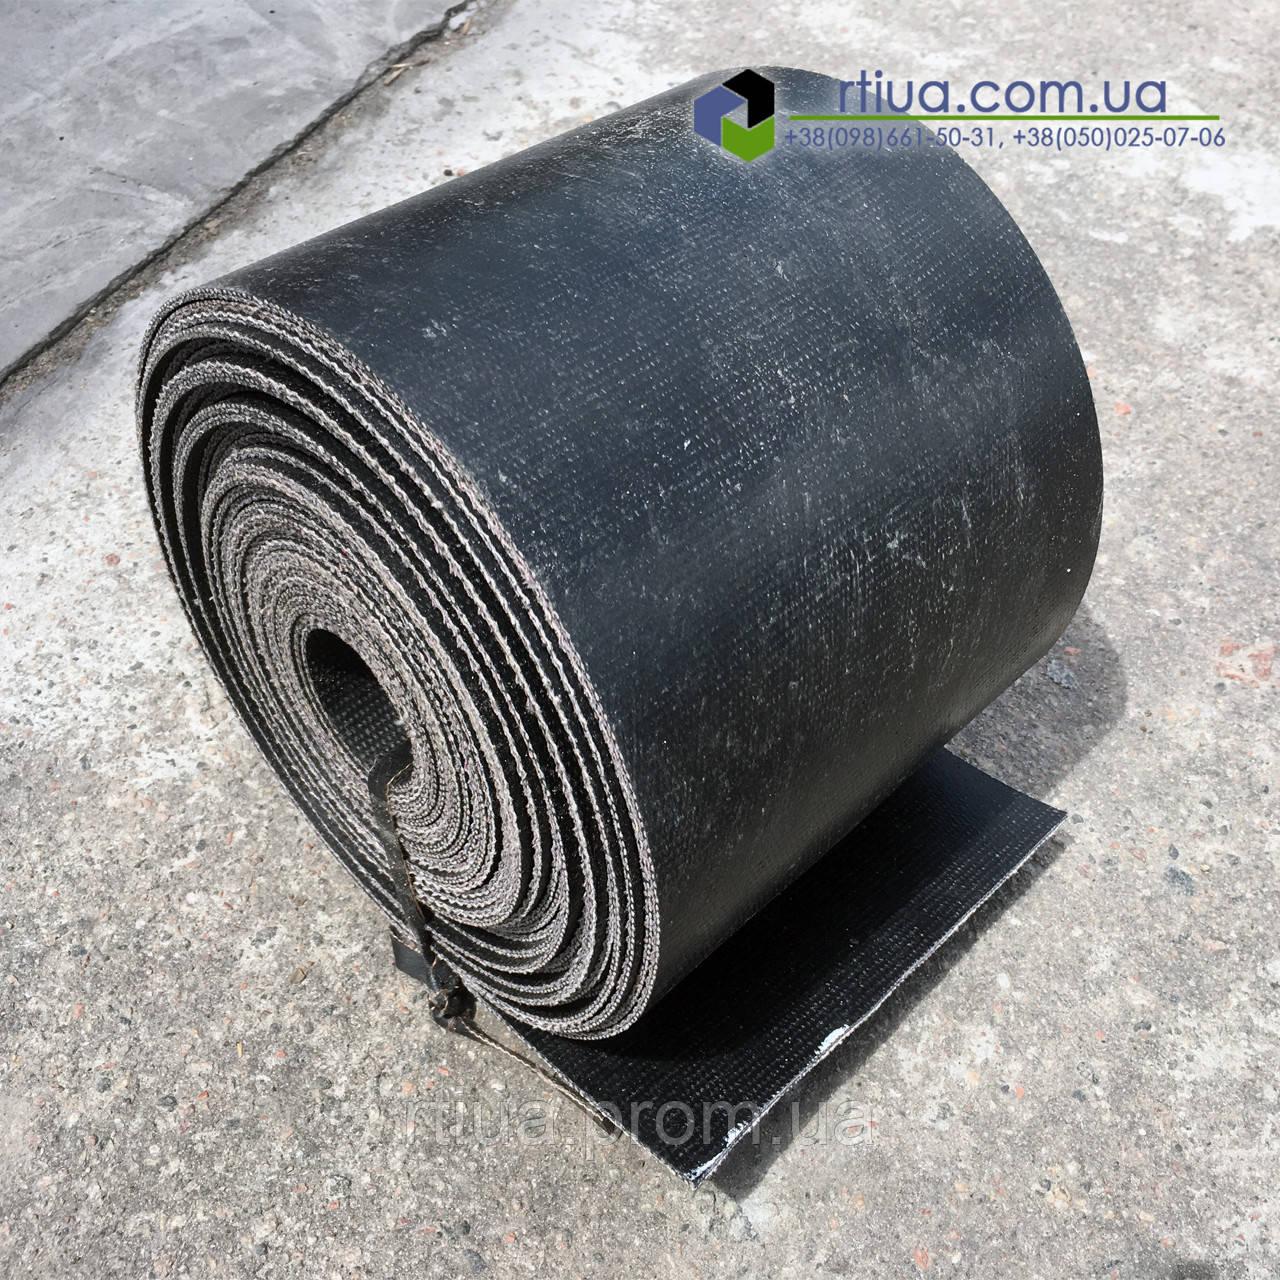 Транспортерная лента ТК-200, 400х4 - 4/2 (10 мм)